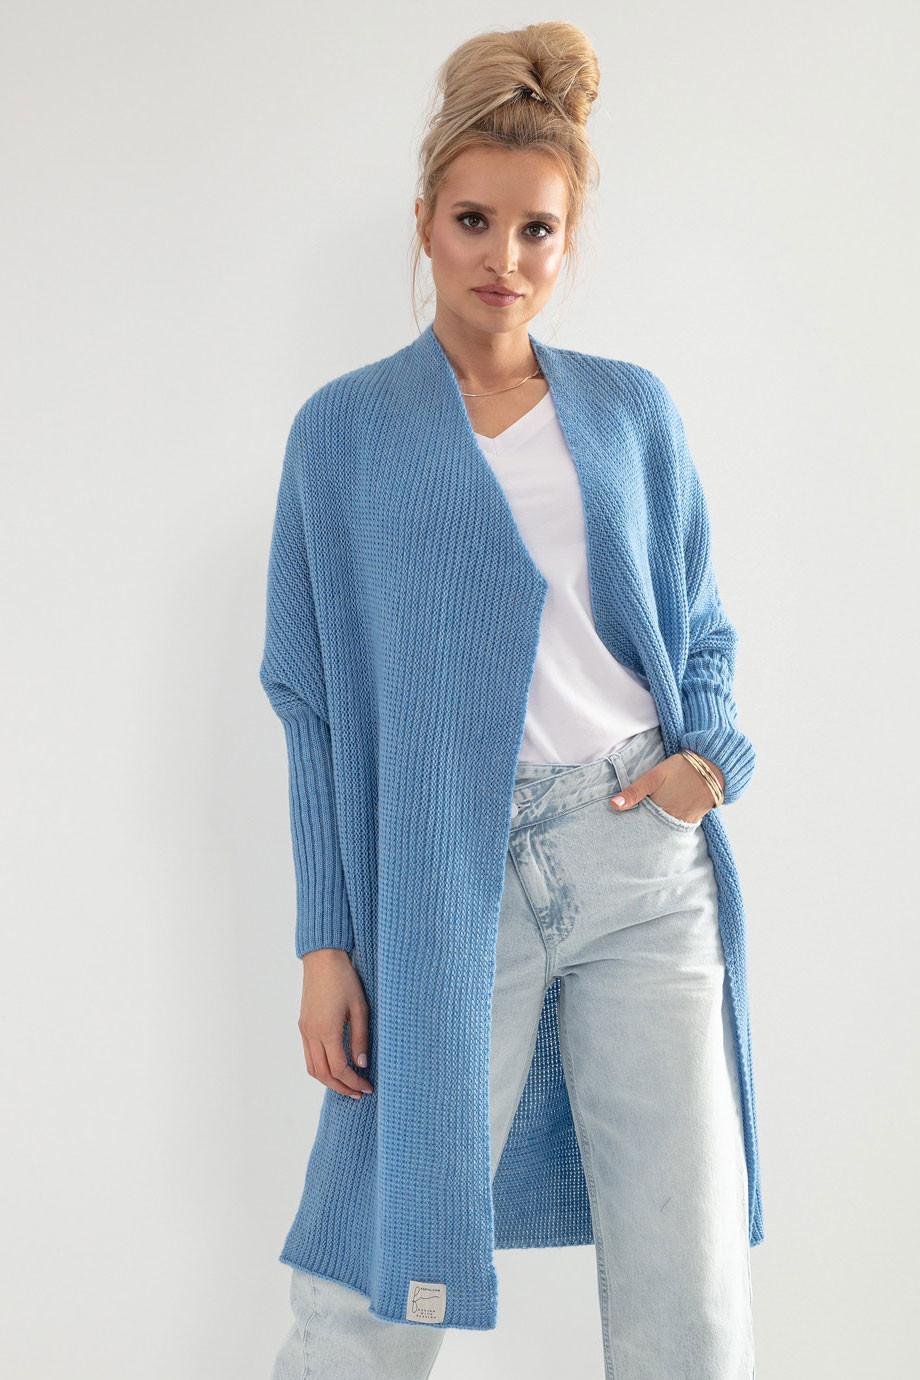 Glara Dámský pletený kabátek kardigan s vlnou 707175